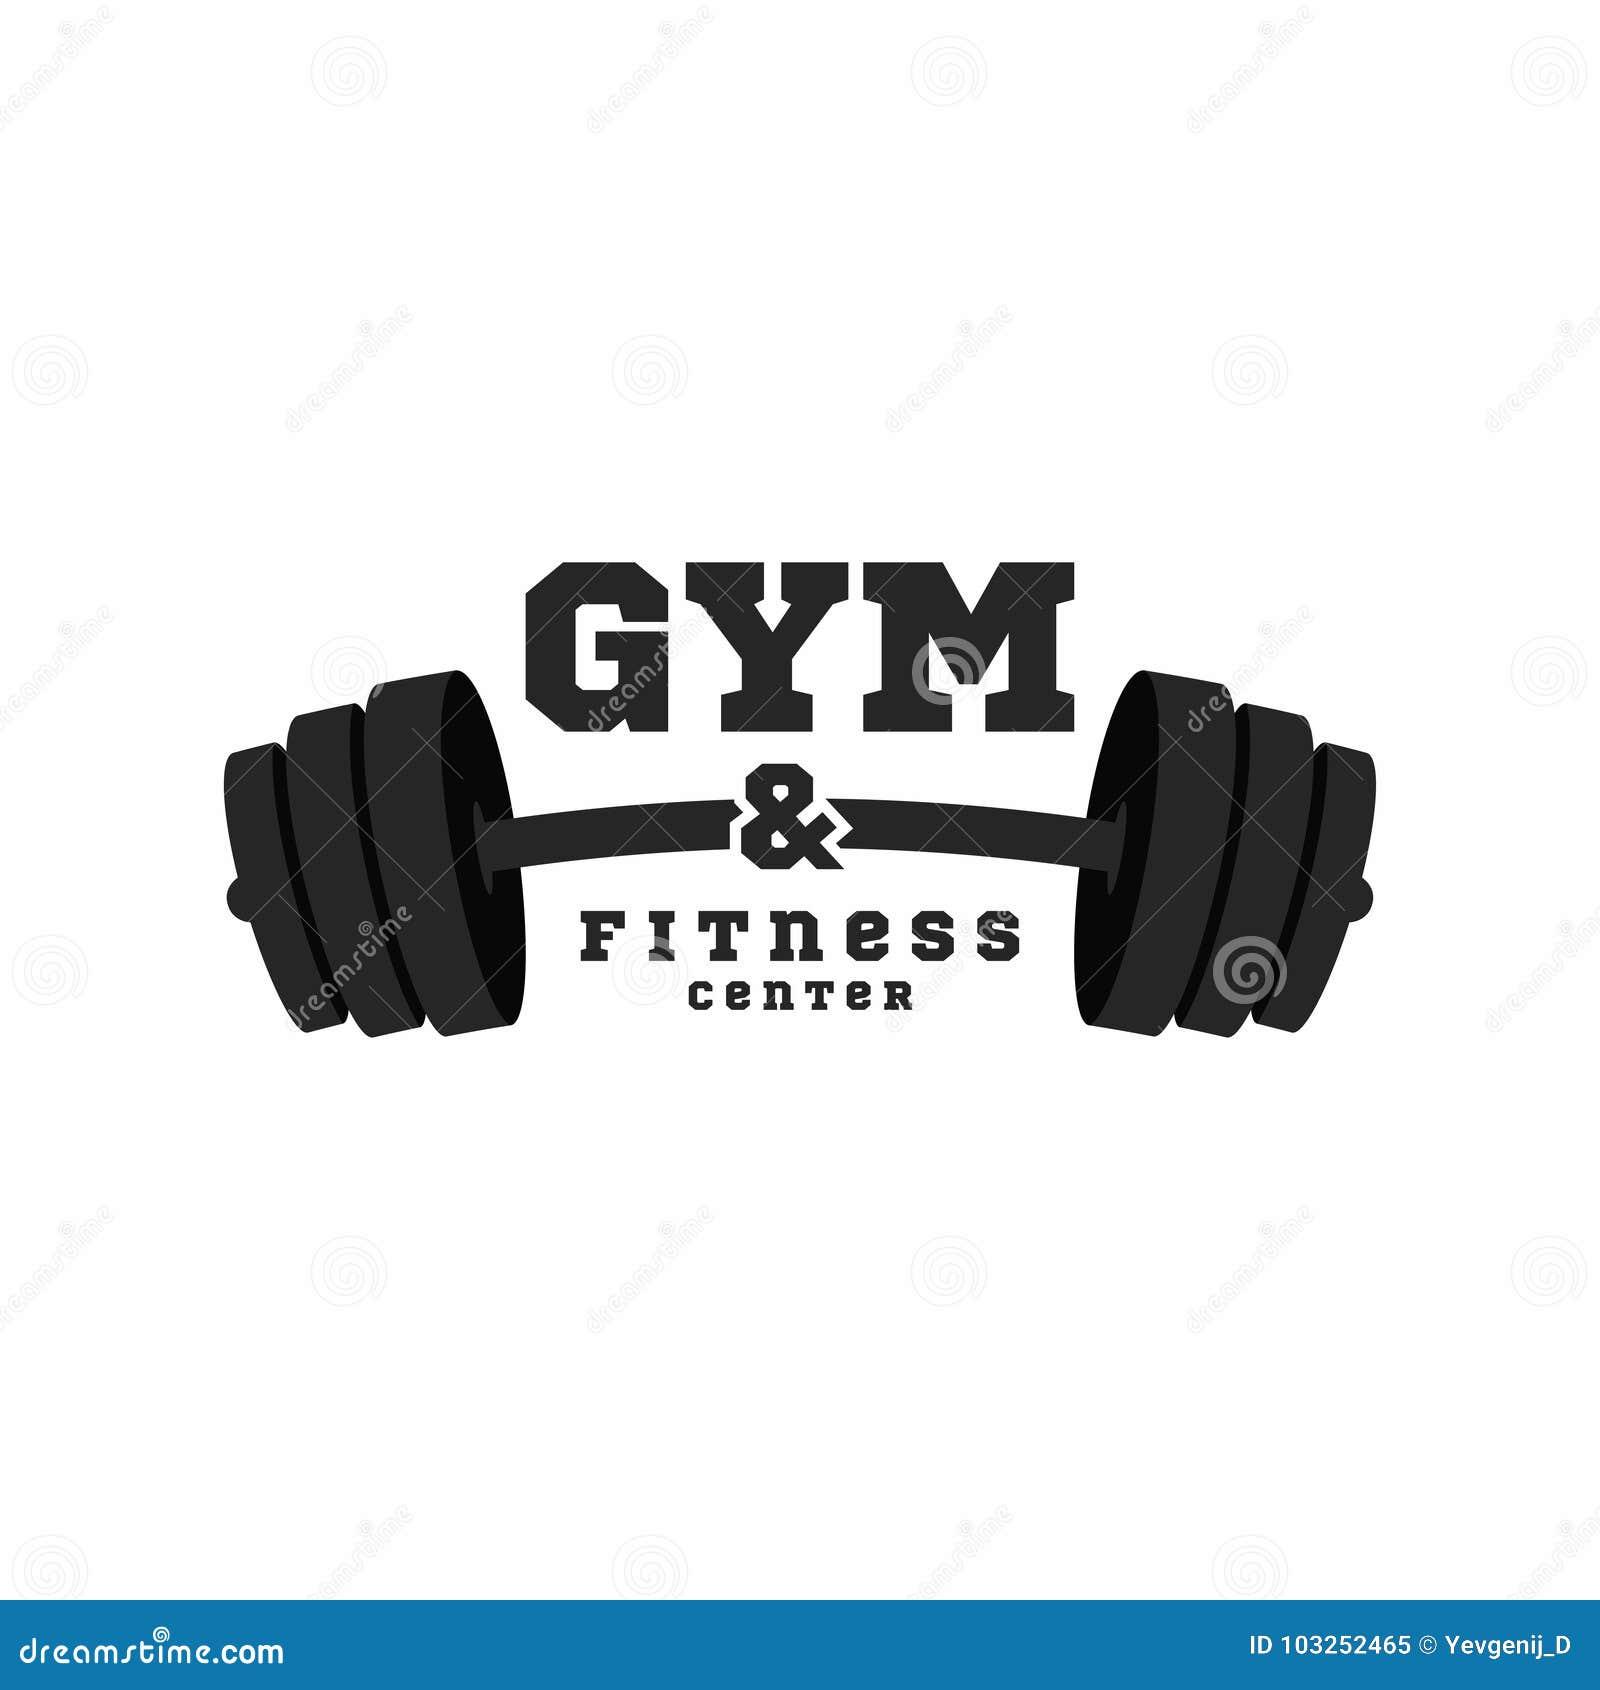 Gym logo. Fitness center logo design template. Black barbell isolated on white background